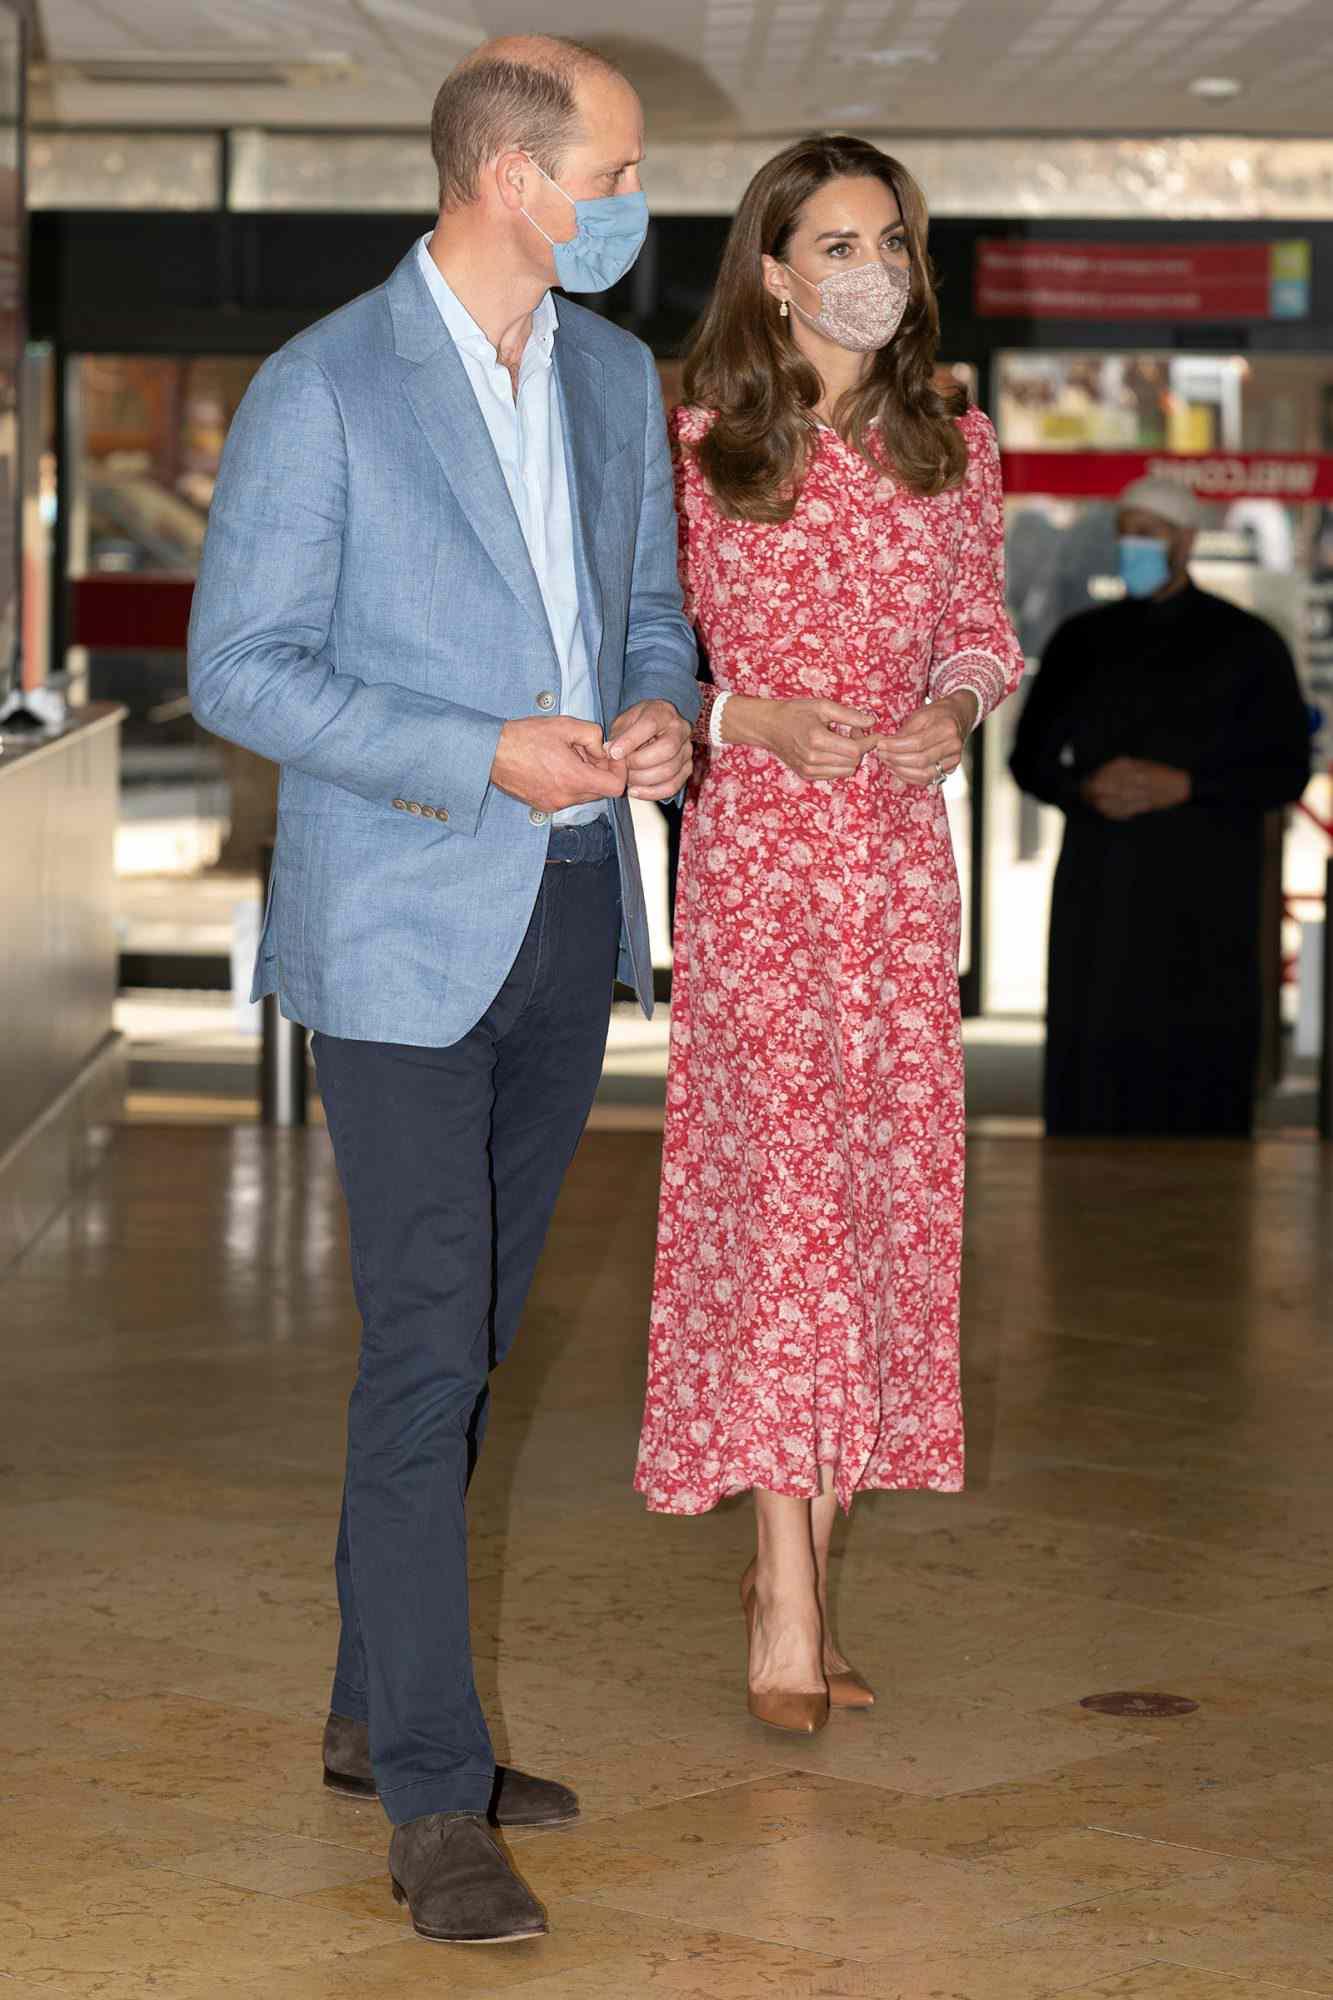 Kate Middleton Duchess Of Cambridge : middleton, duchess, cambridge, Middleton, Prince, William, Masks, London, PEOPLE.com